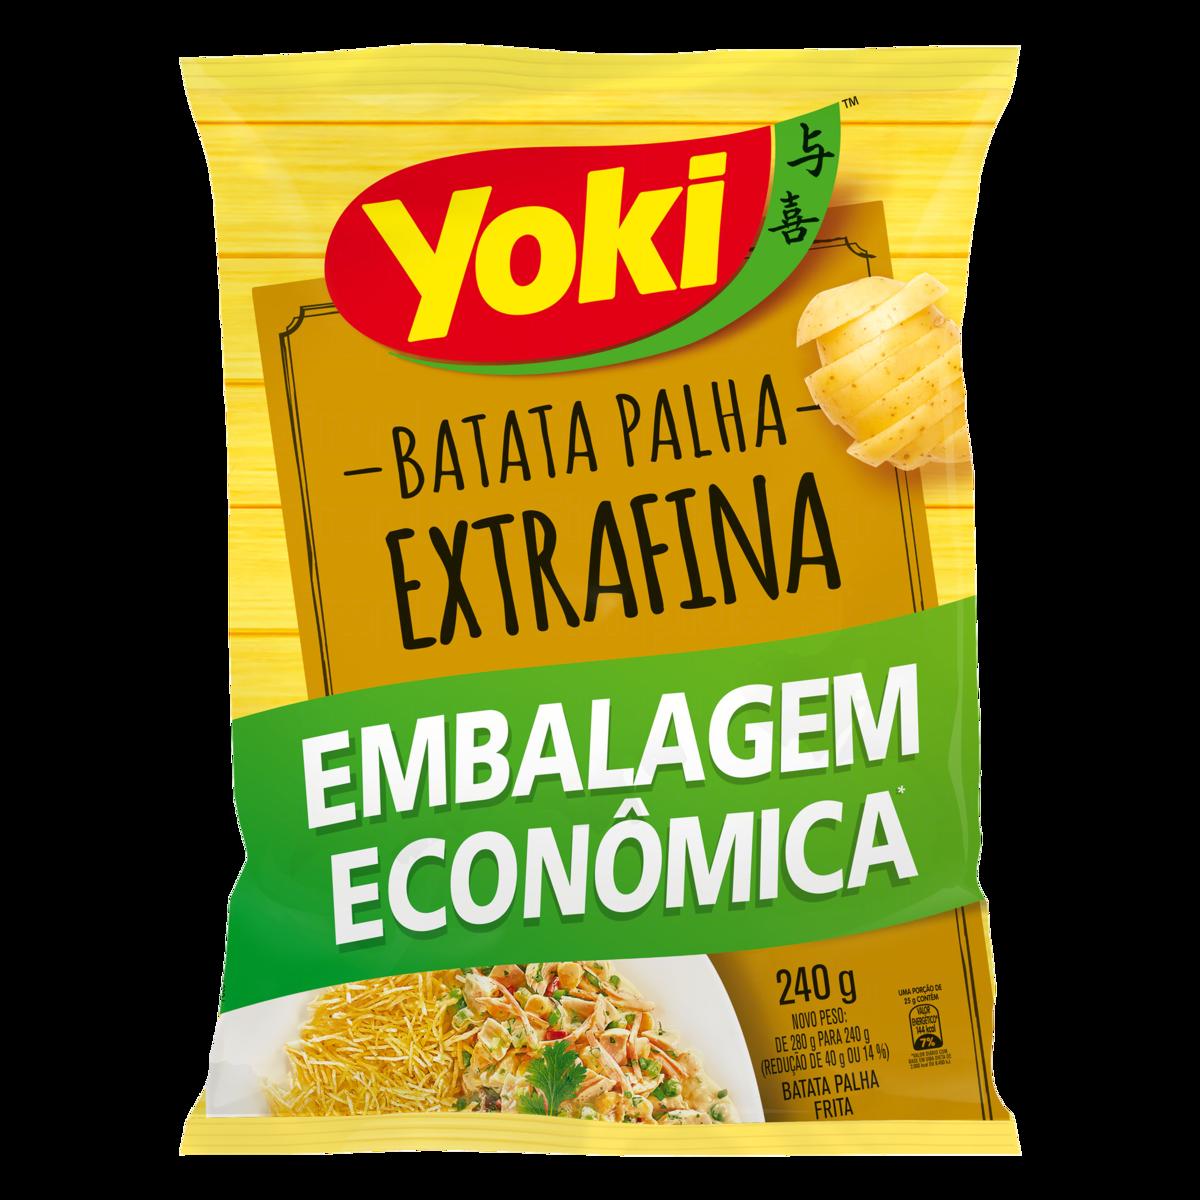 BATATA PALHA YOKI 240G EXTRAFINA